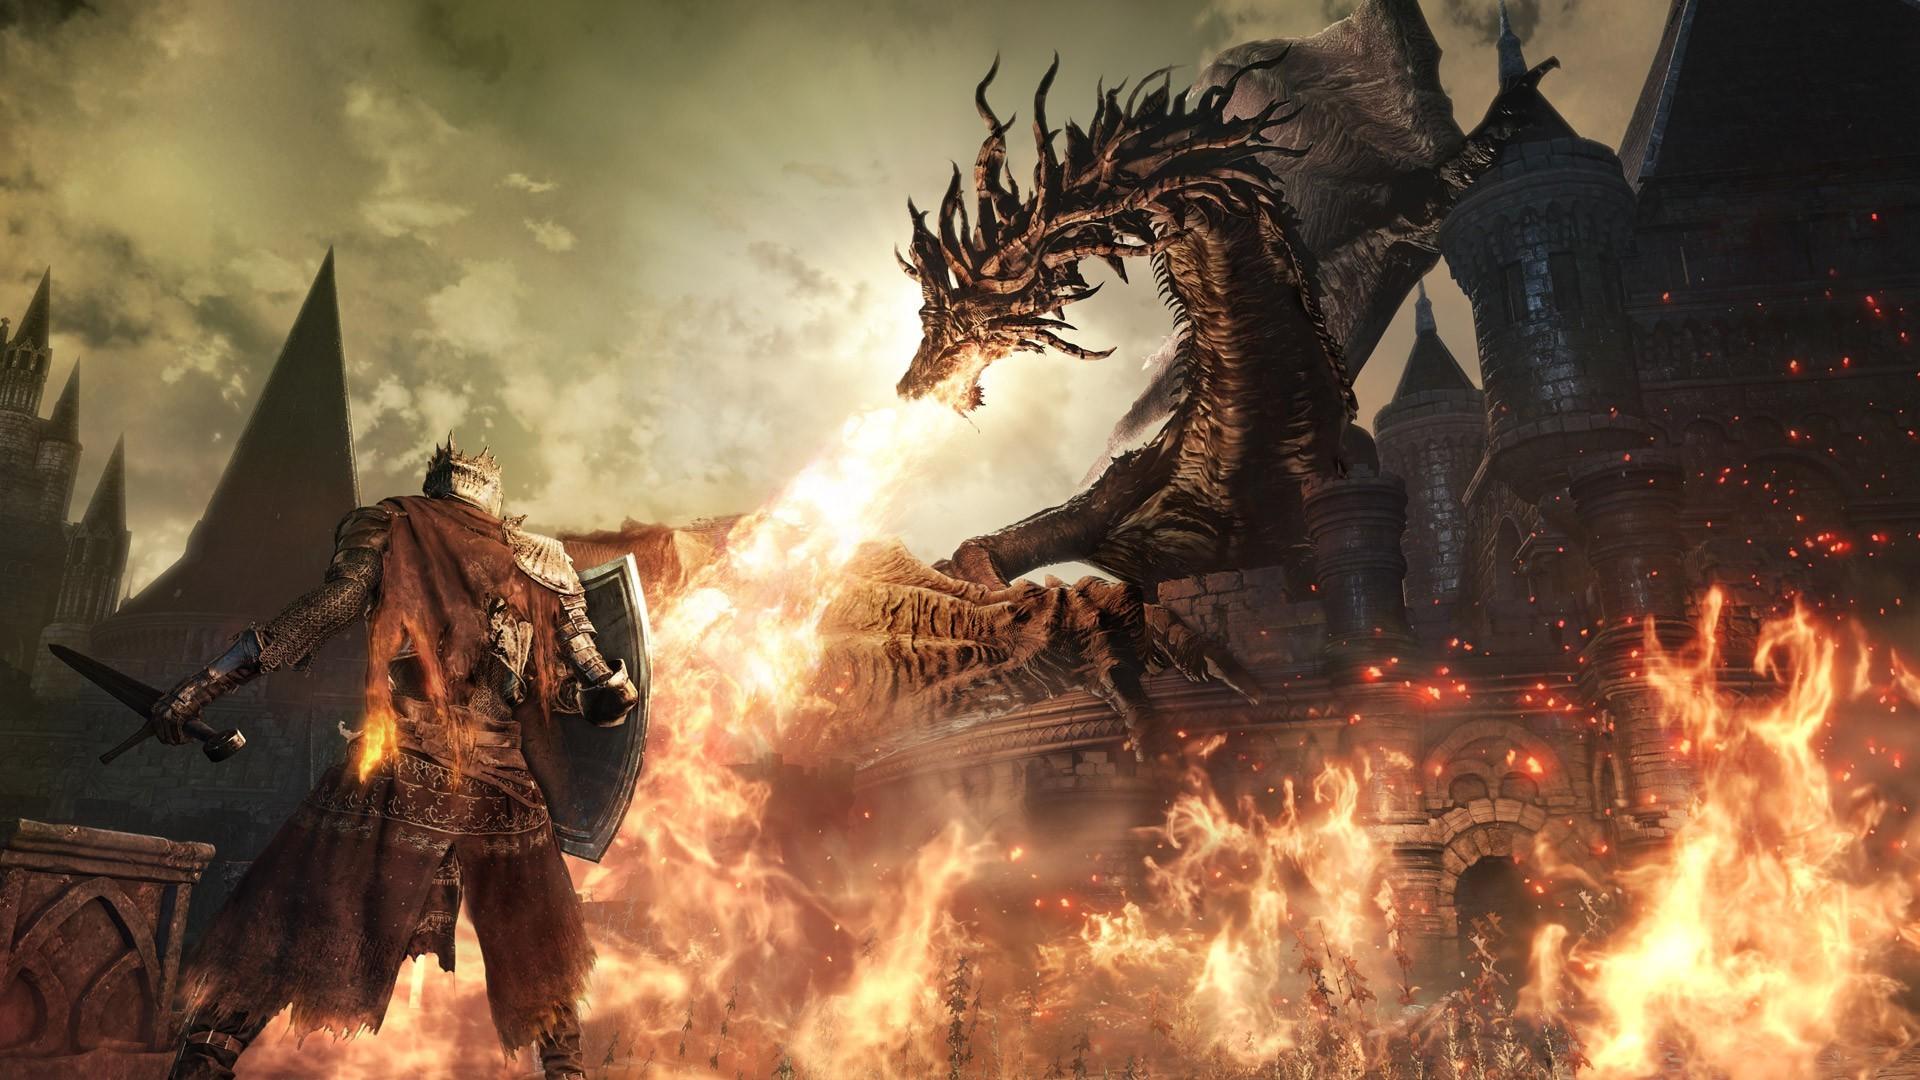 Wallpaper 1920x1080 Px Dark Souls Dark Souls Iii Dragon Fire